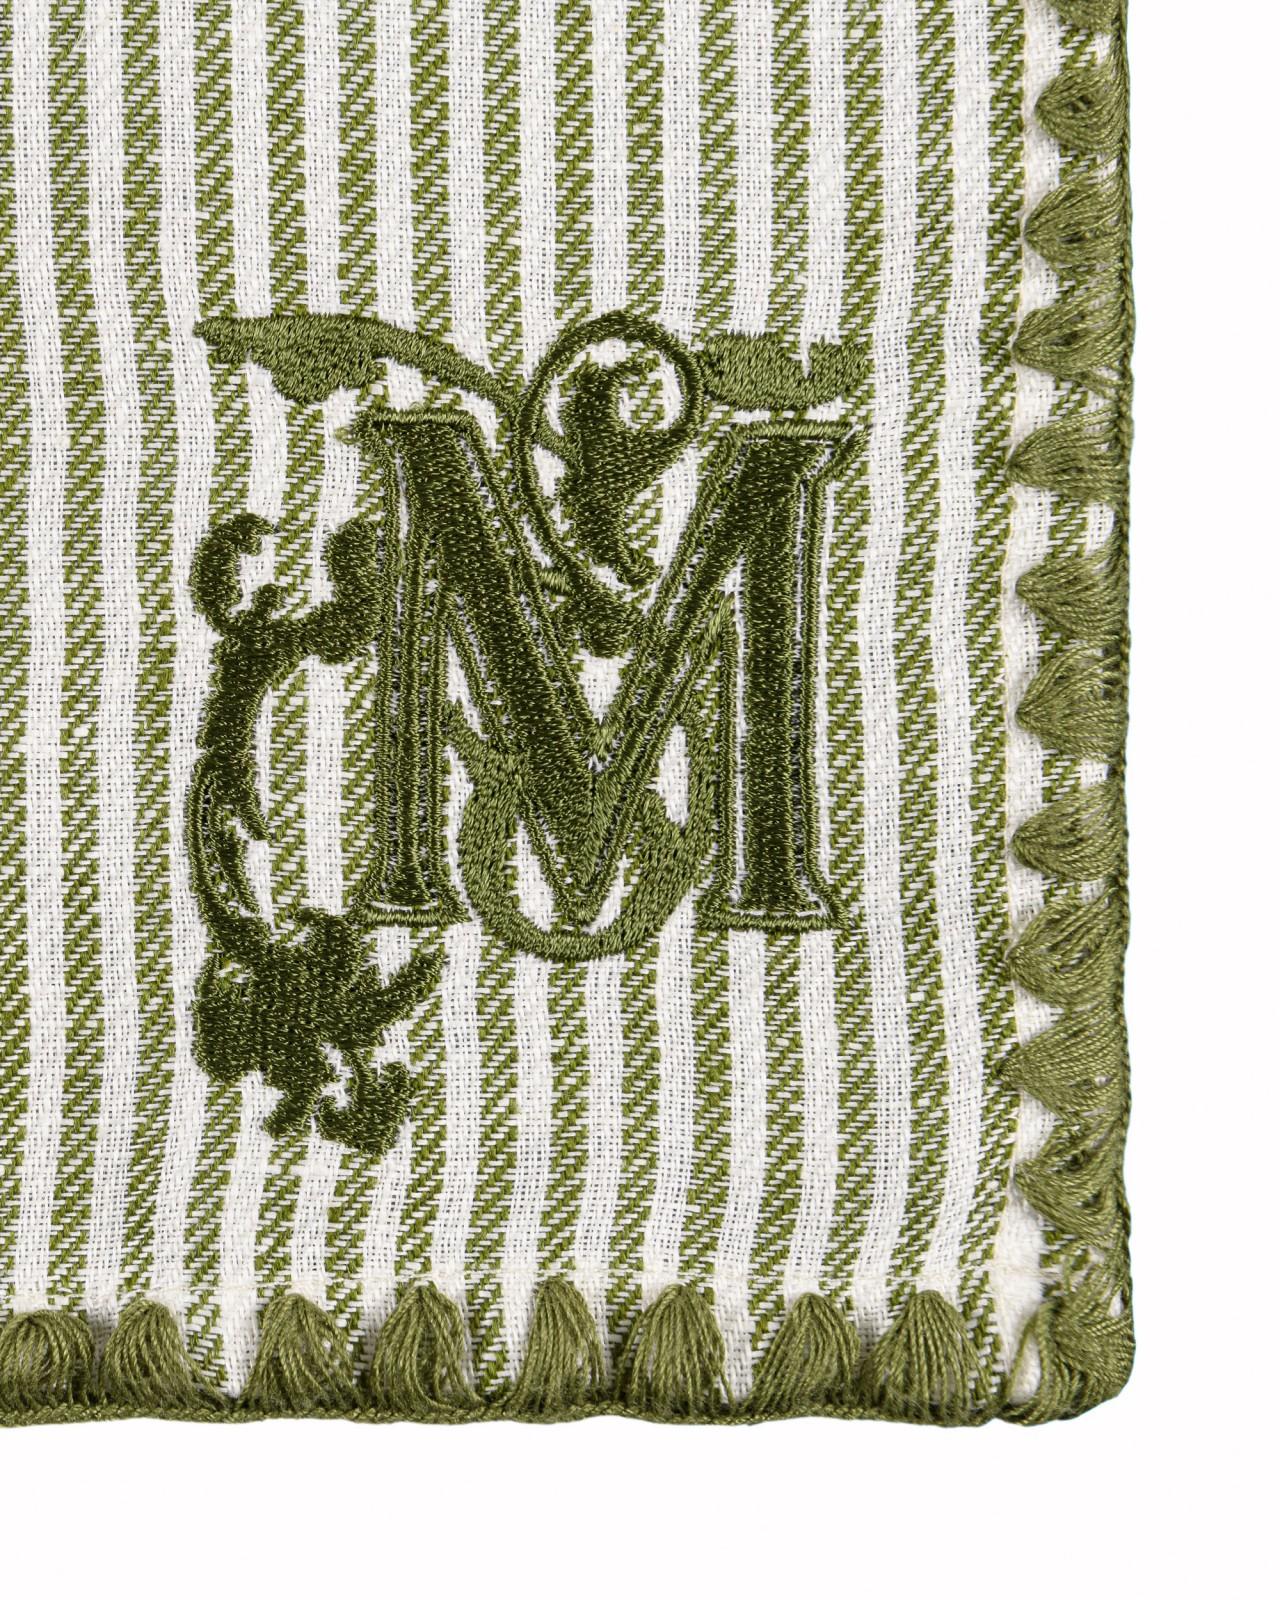 TWILL STRIPE GREEN Monogrammed Napkin Set